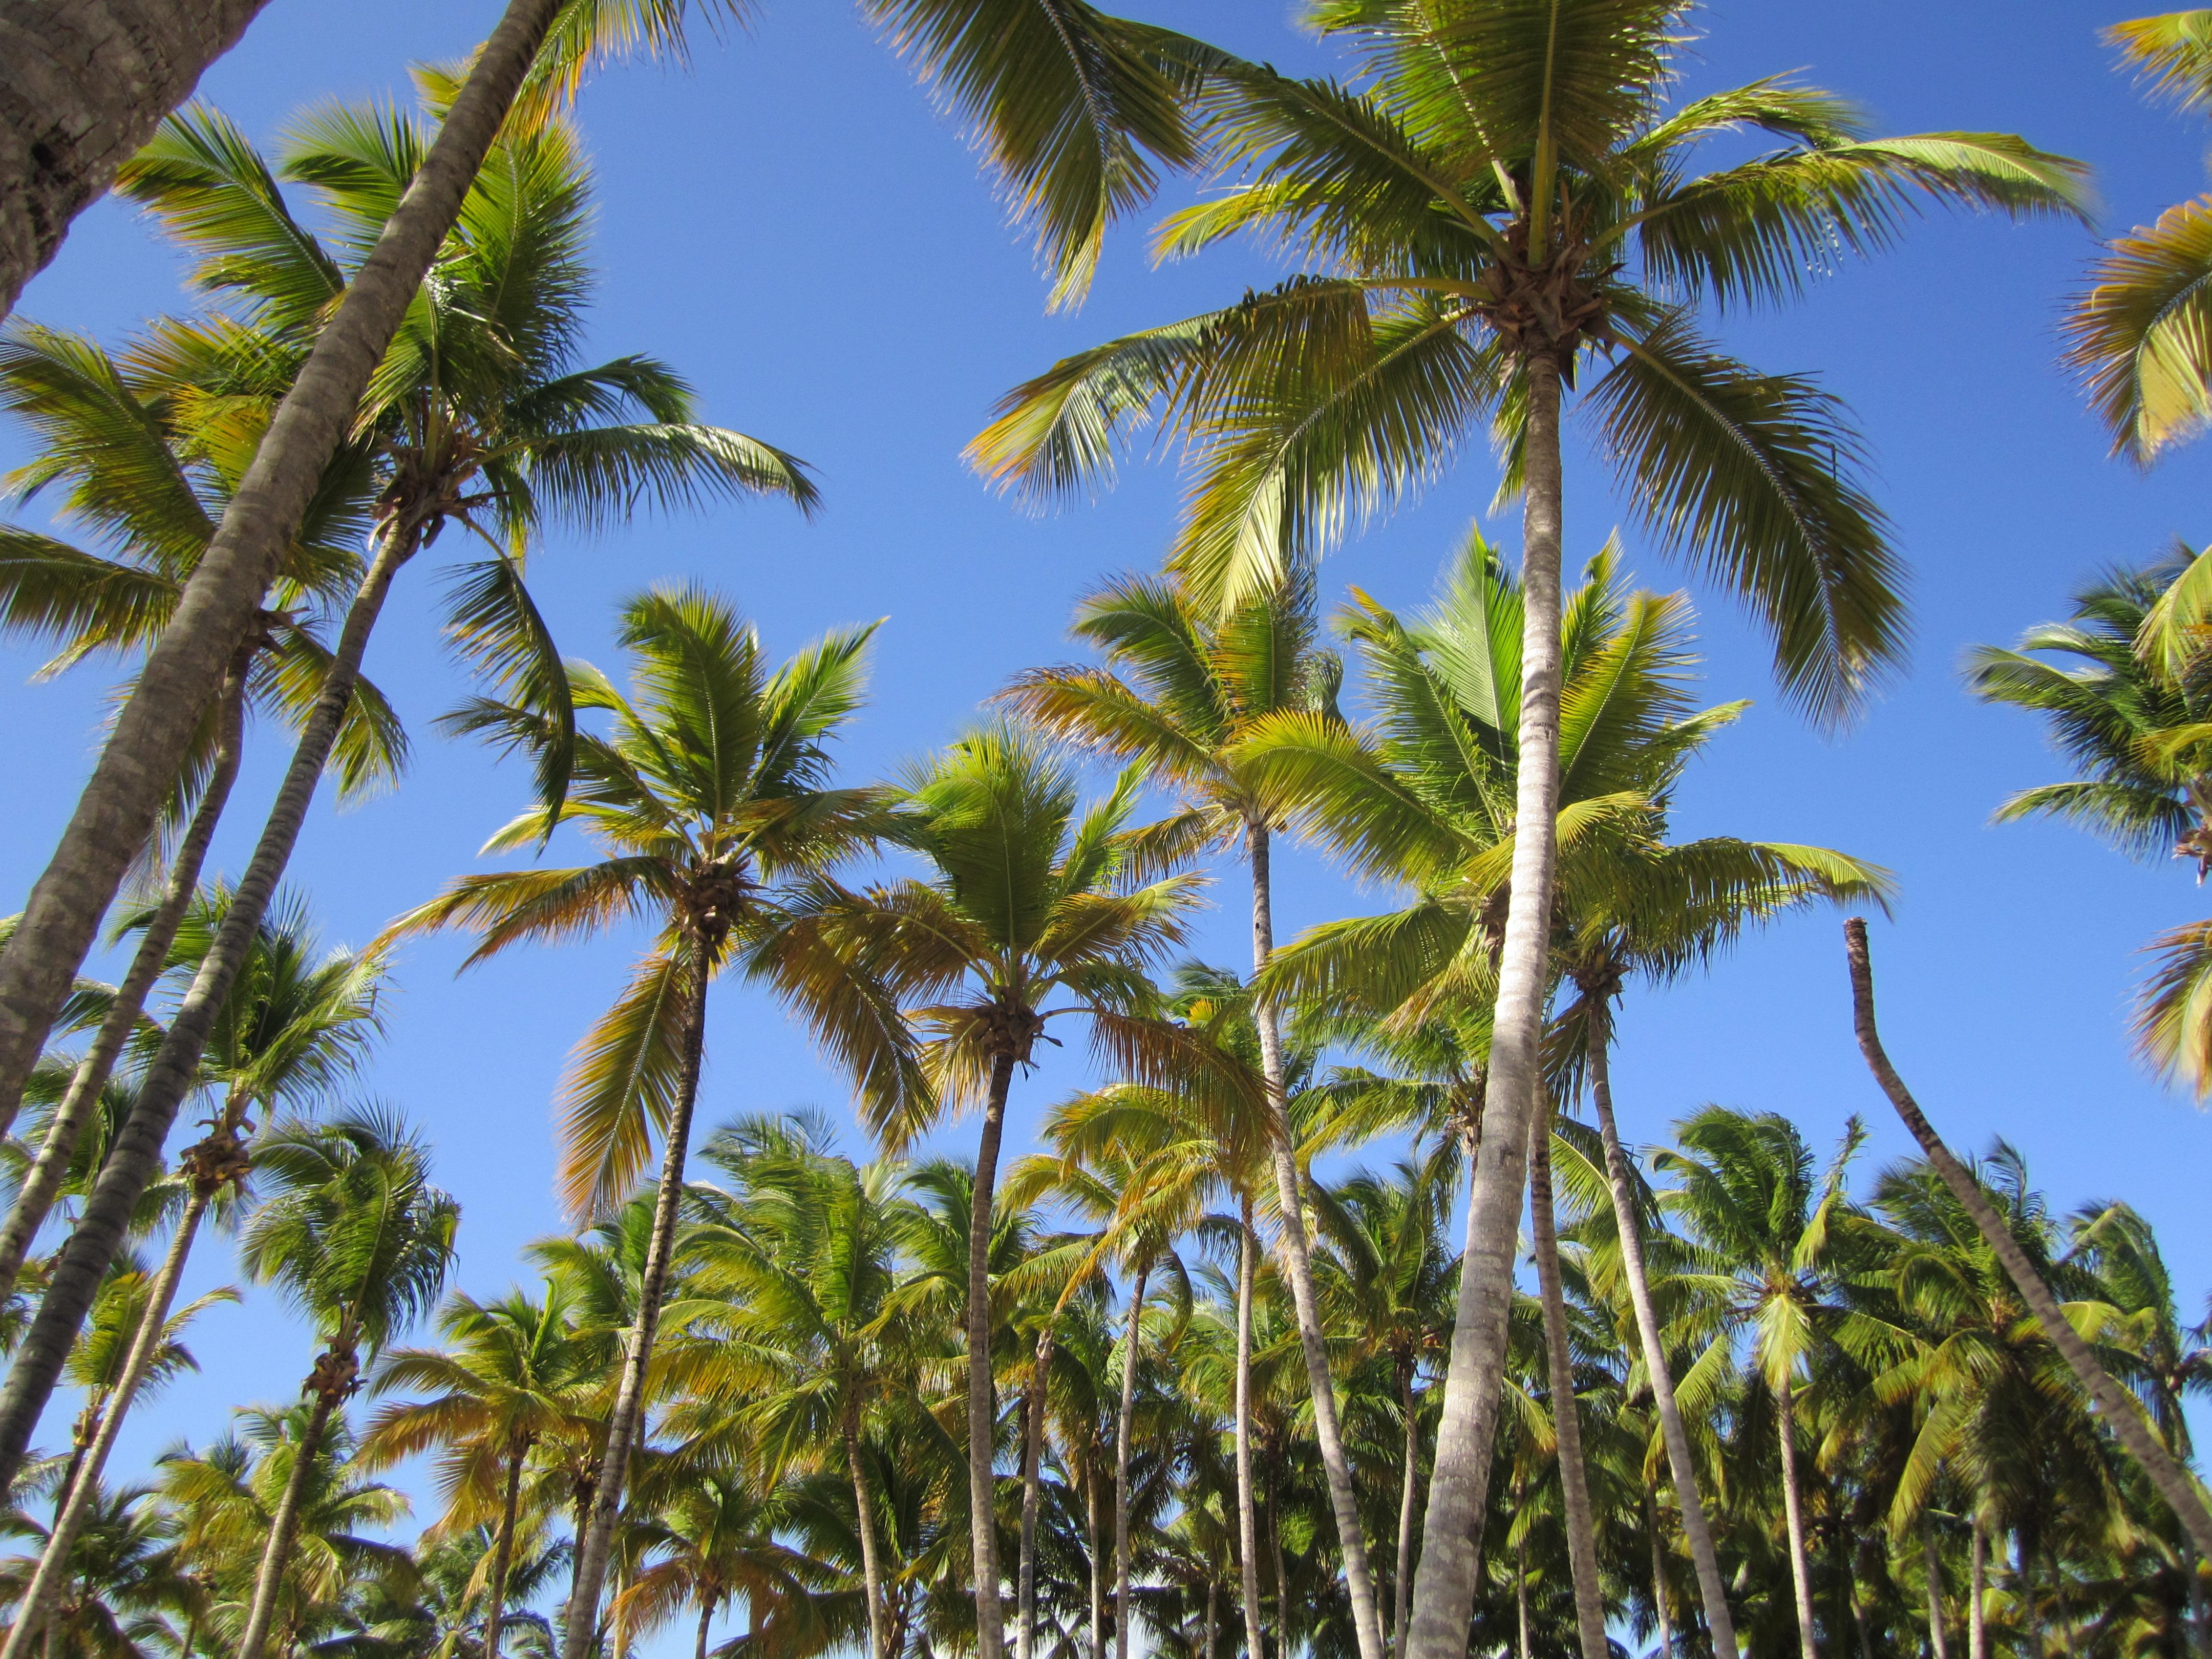 trees palm blue - photo #2